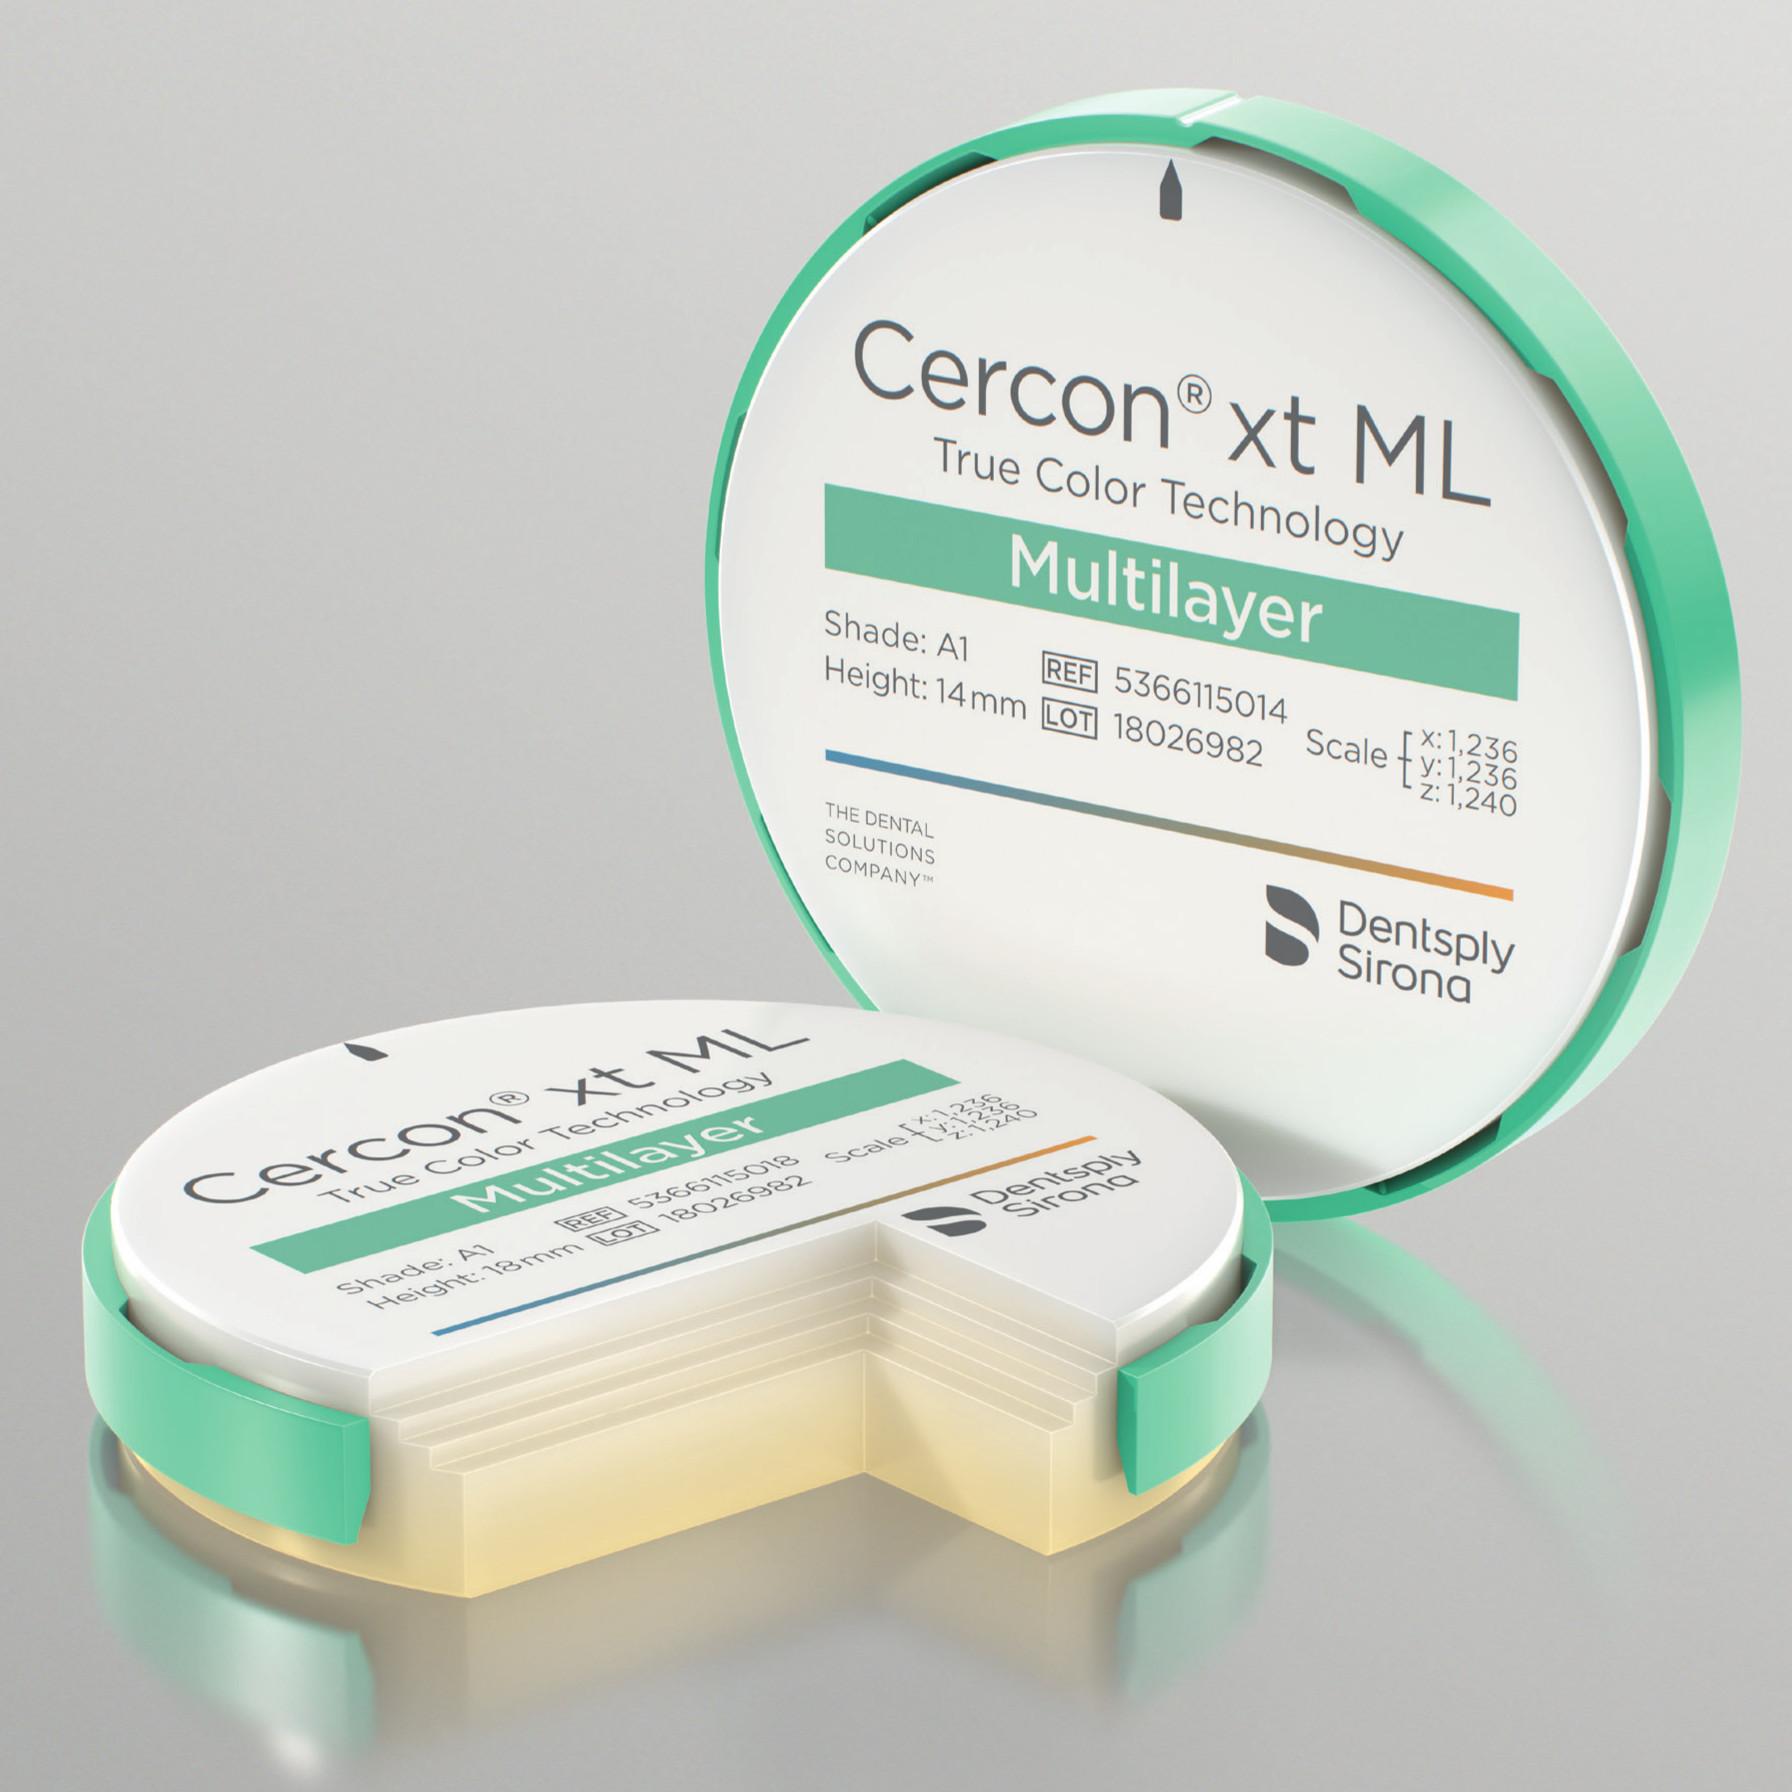 Cercon® xt ML – Zirconia Extra Traslucente multistrato